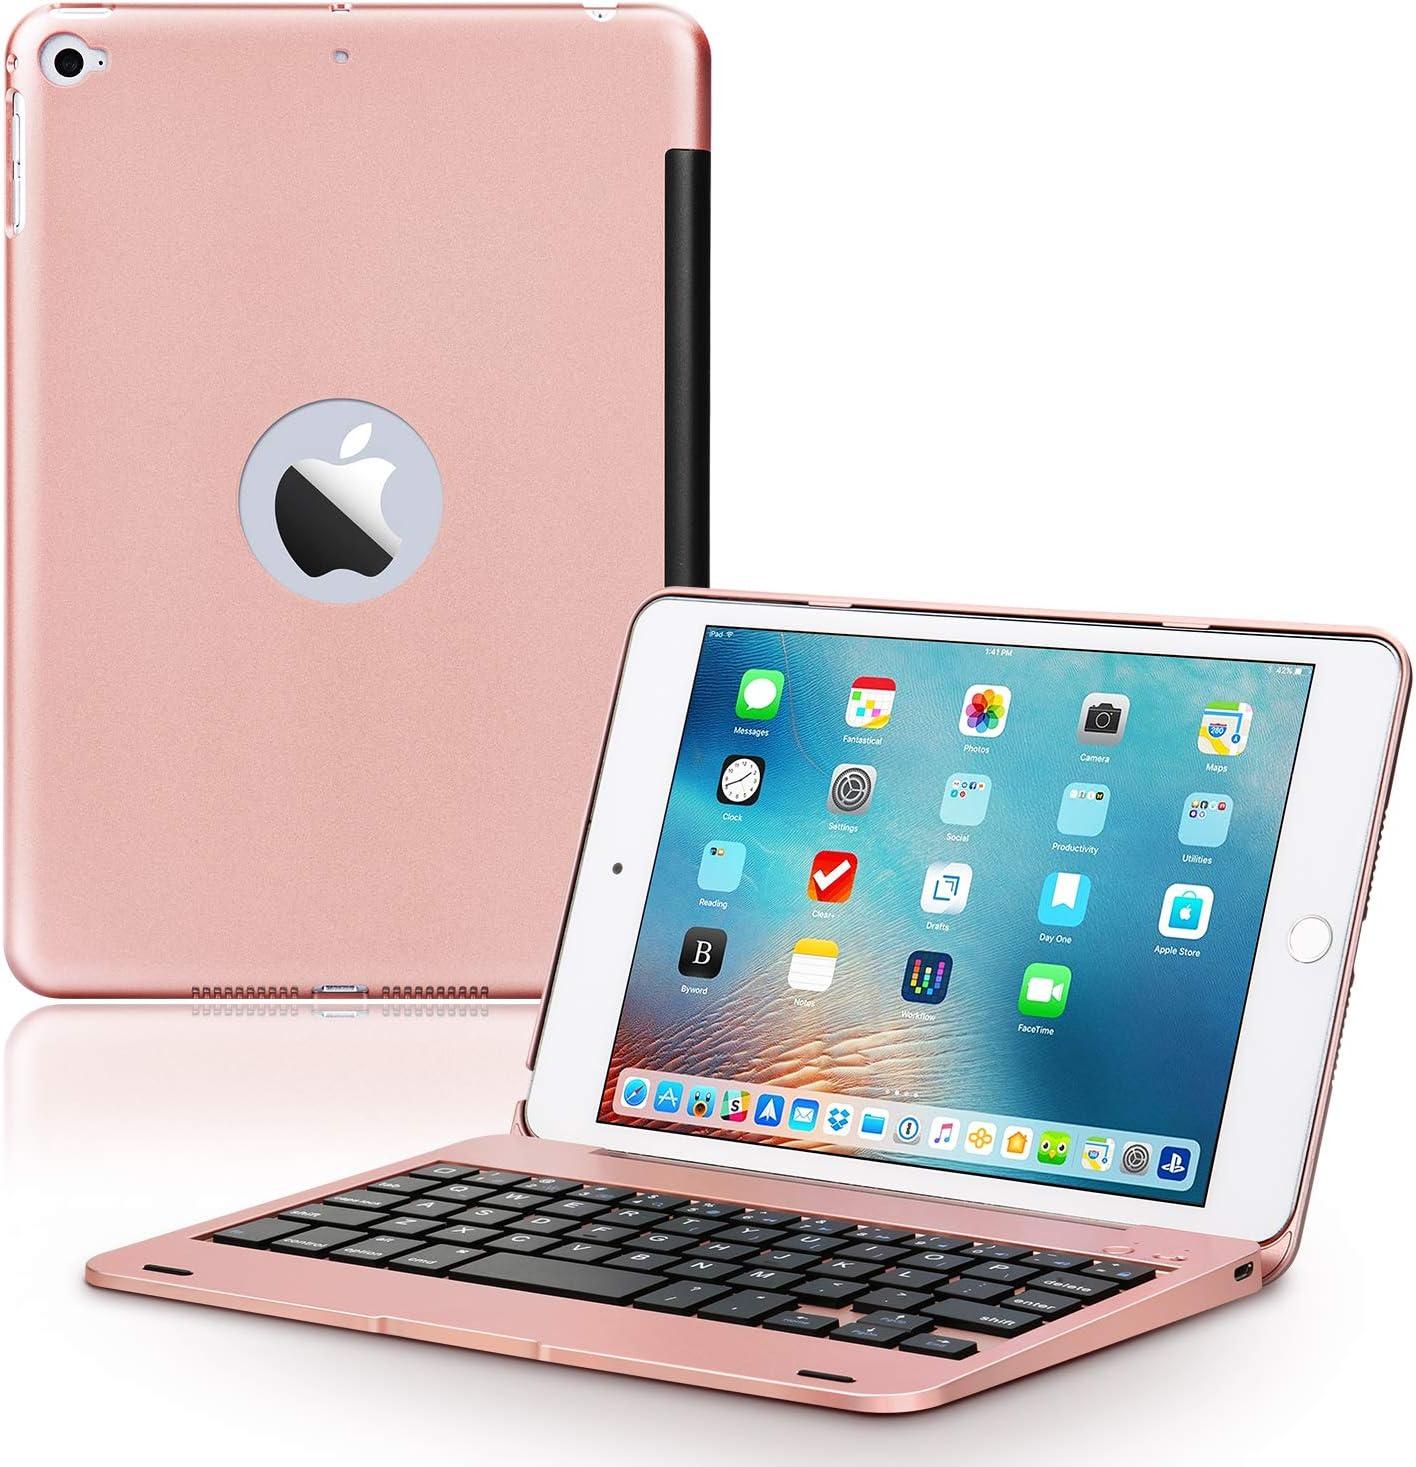 ONHI Wireless Keyboard Case for iPad Mini 5 / Mini 4 Keyboard Case Plastic Alloy Shell Smart Folio Case Auto Sleep/Wake, Silent Typing (Mini 4/5 Rose Gold)